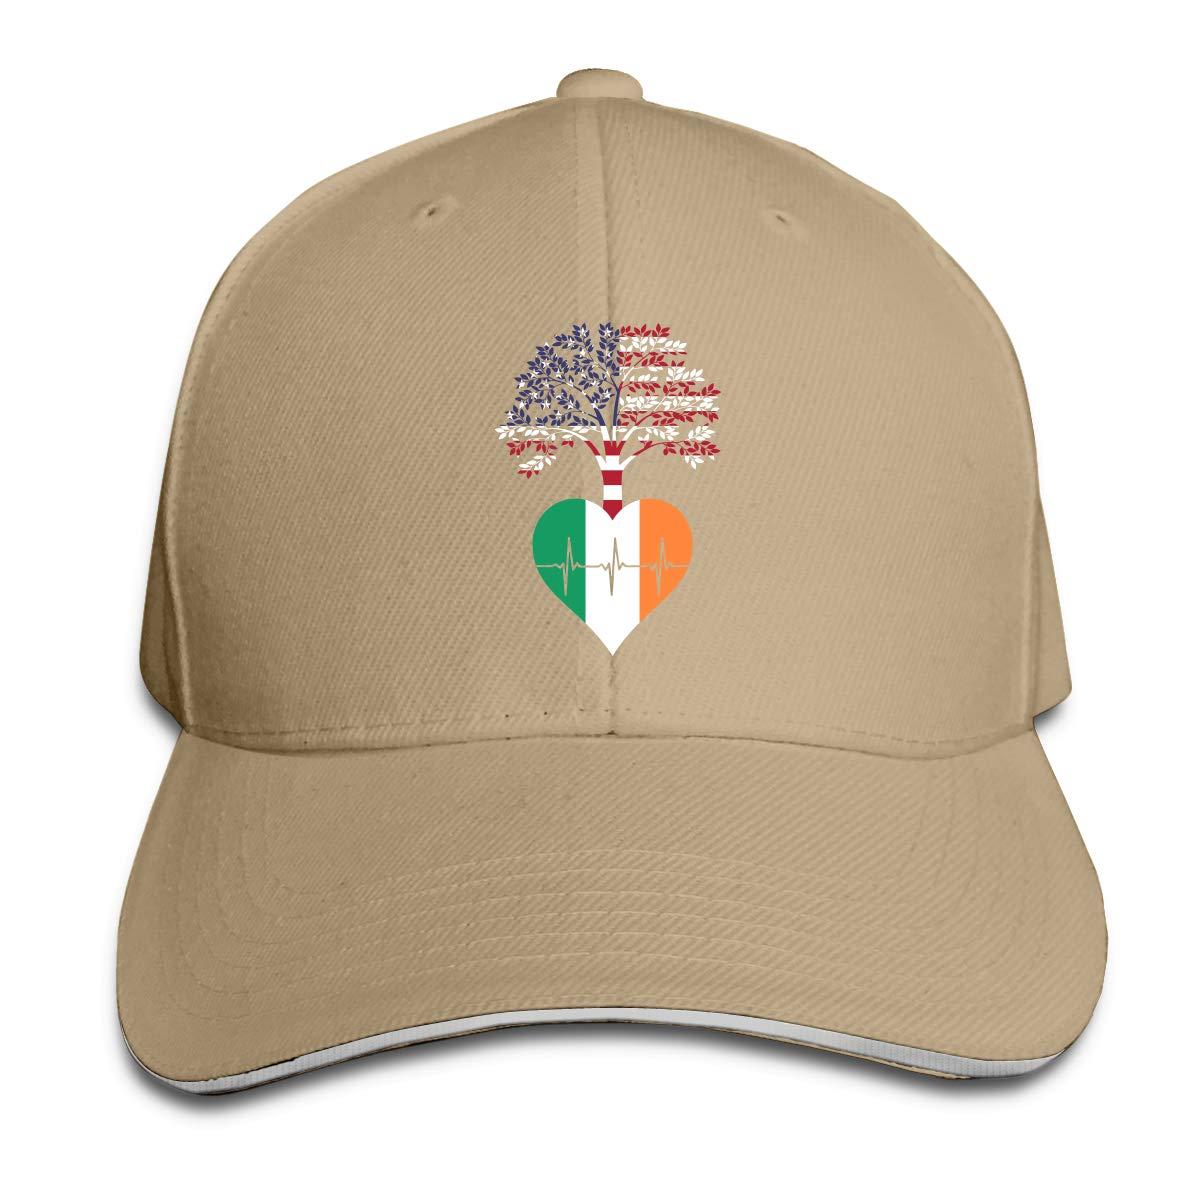 WFIRE Adult Baseball Caps Ireland US Root Heartbeat Custom Adjustable Sandwich Cap Casquette Hats